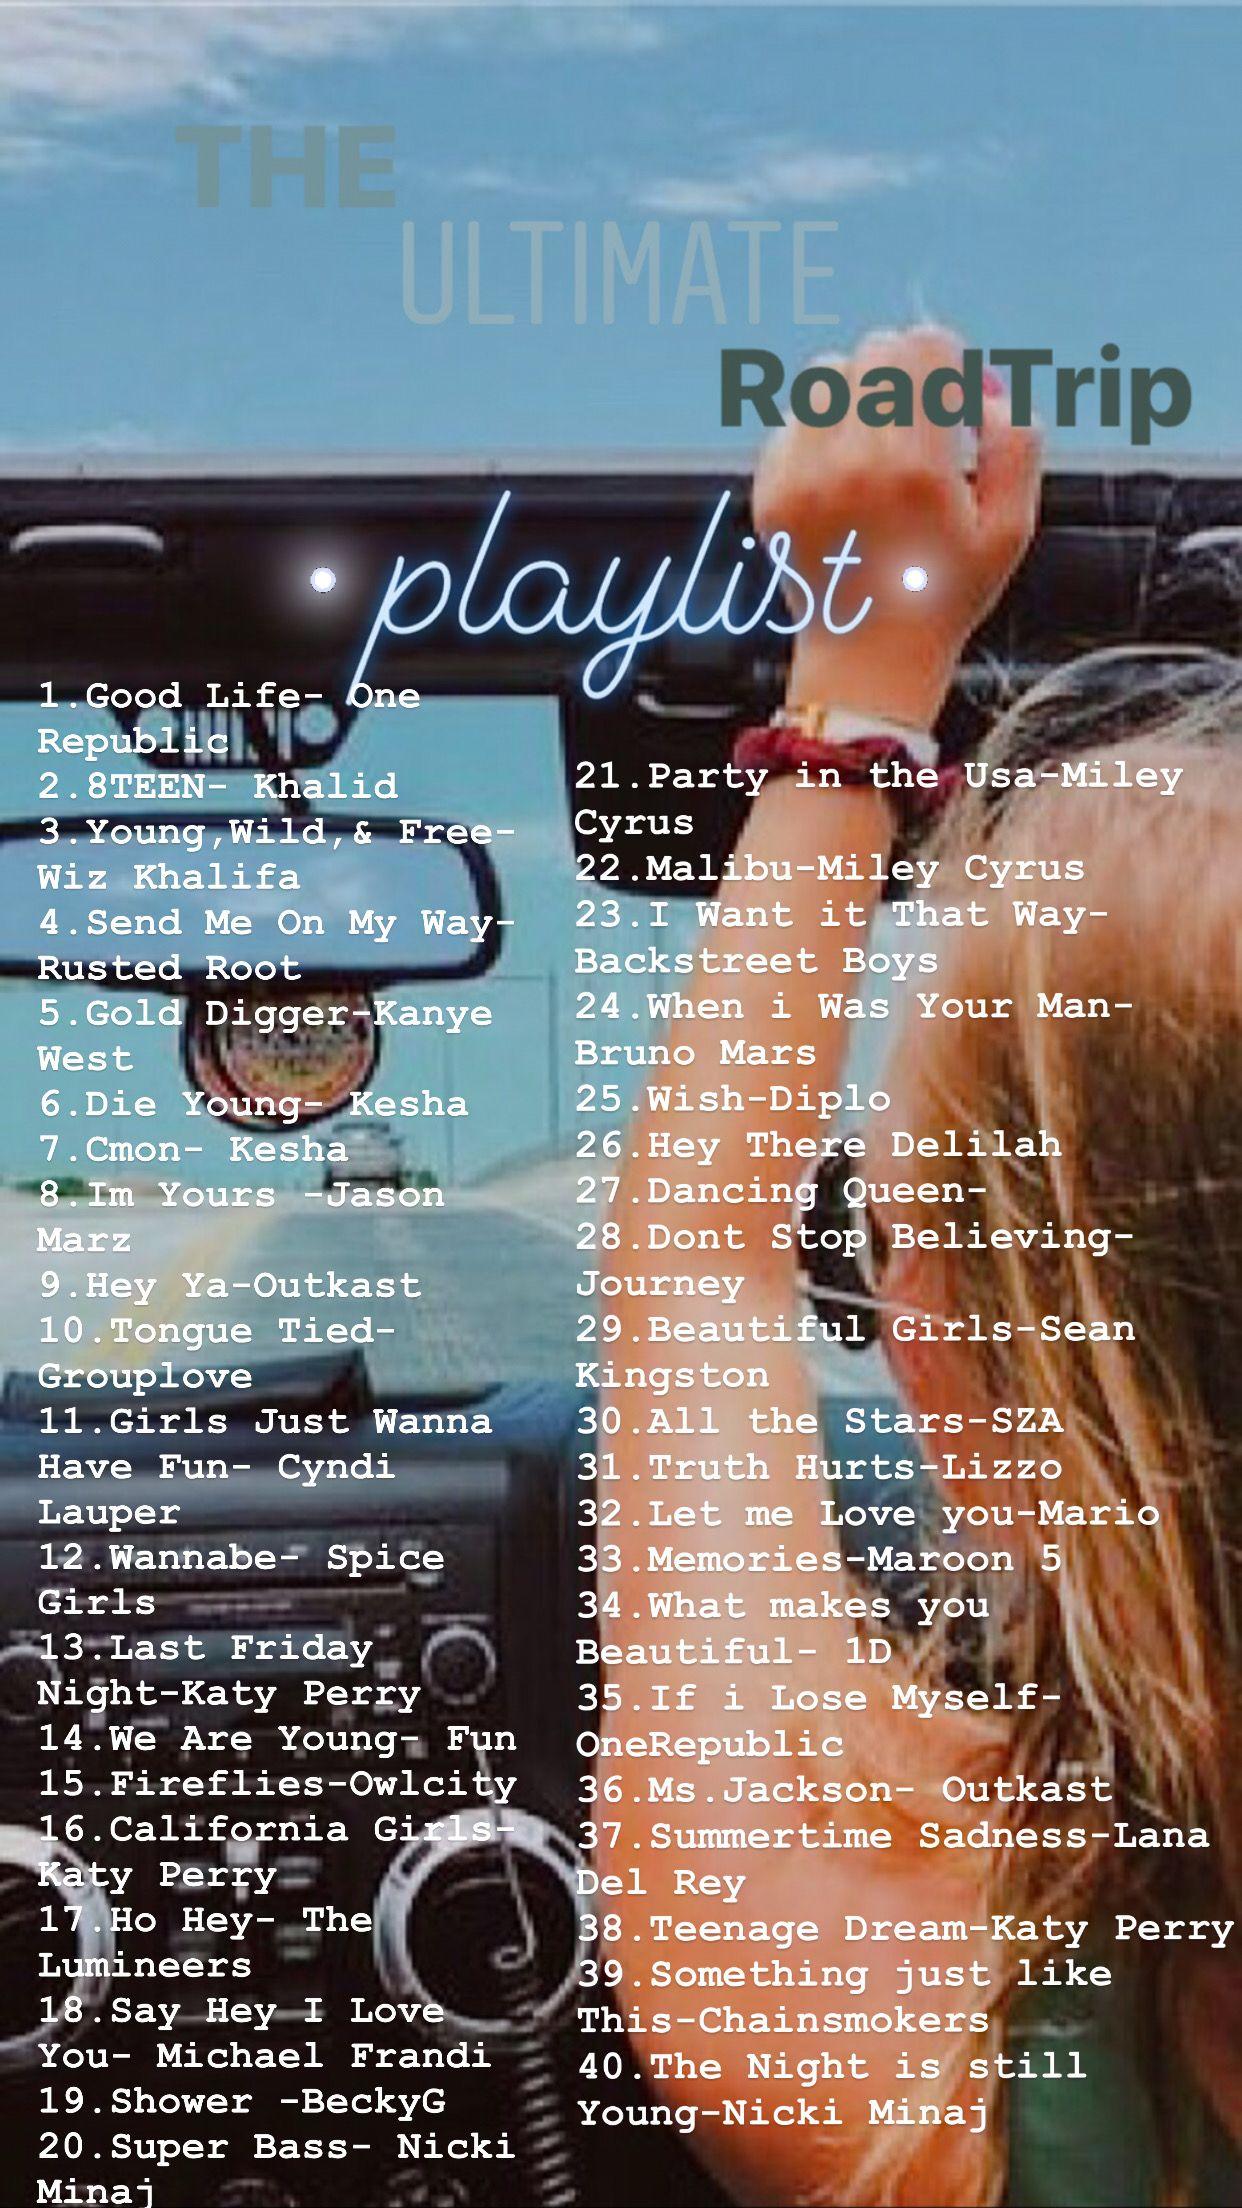 Roadtrip Playlist In 2020 Song Playlist Good Vibe Songs Summer Songs Playlist